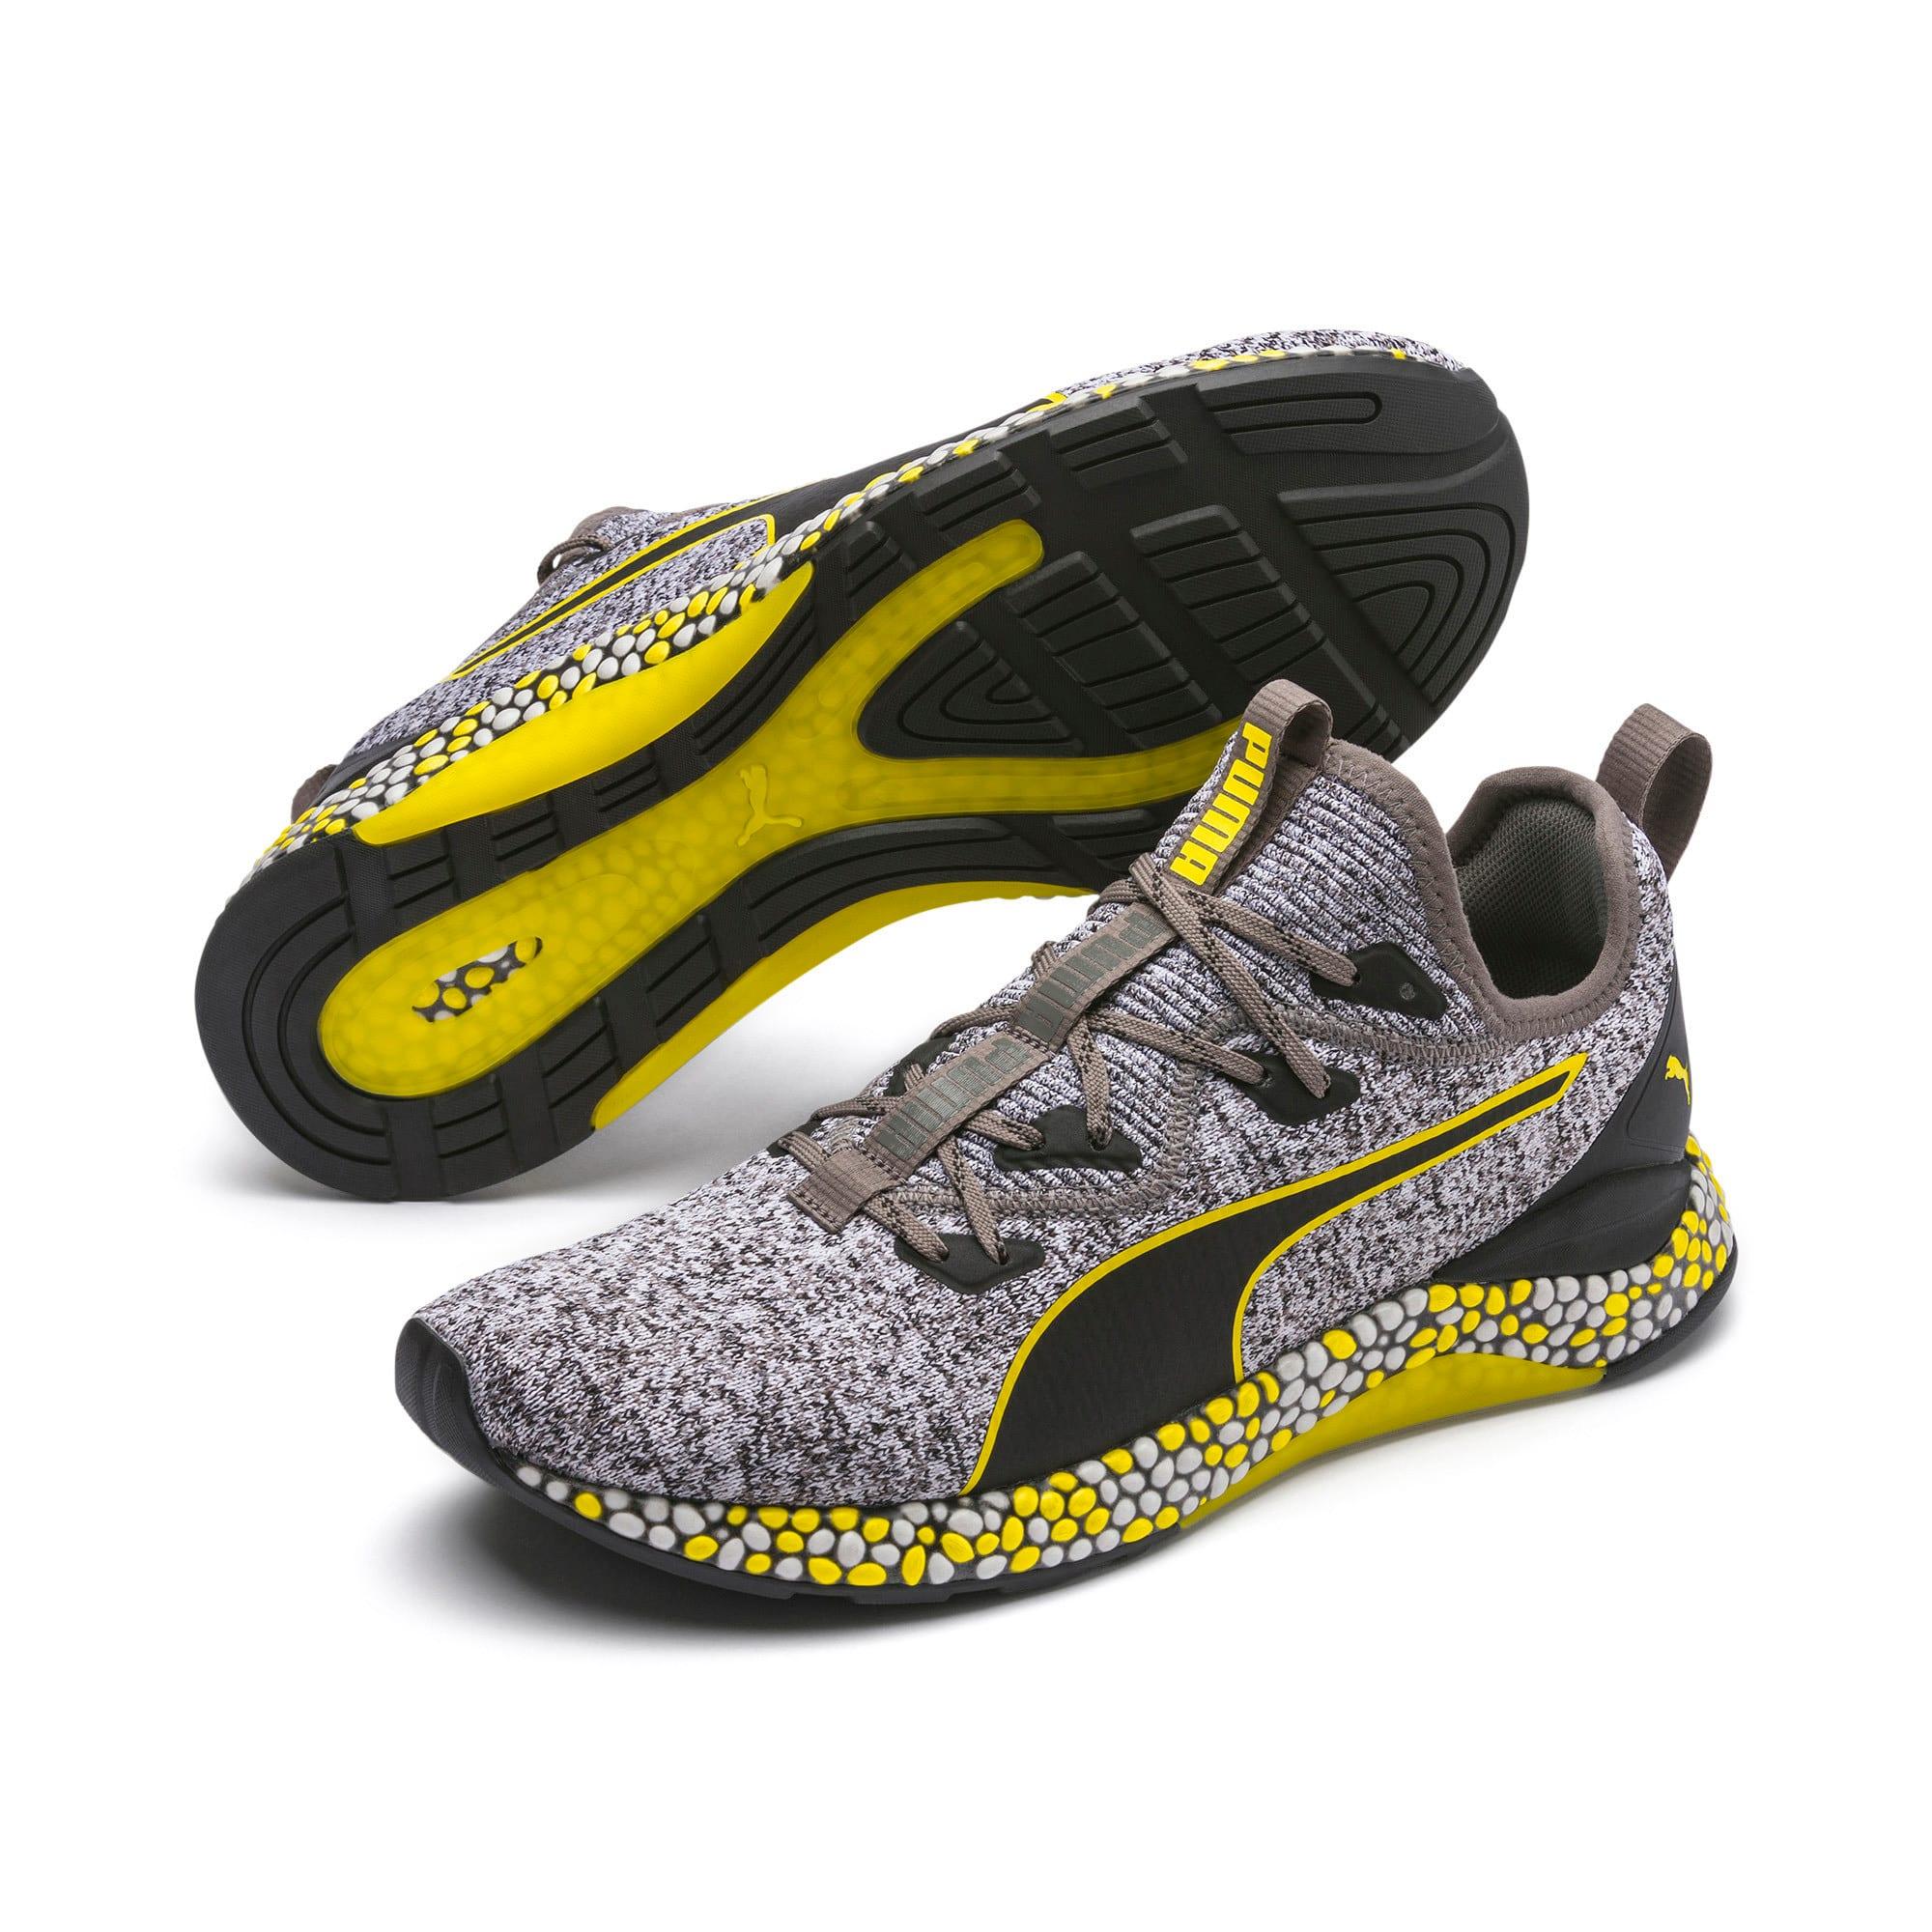 Thumbnail 2 of Hybrid Runner hardloopschoenen voor heren, Black-White-Blazing Yellow, medium